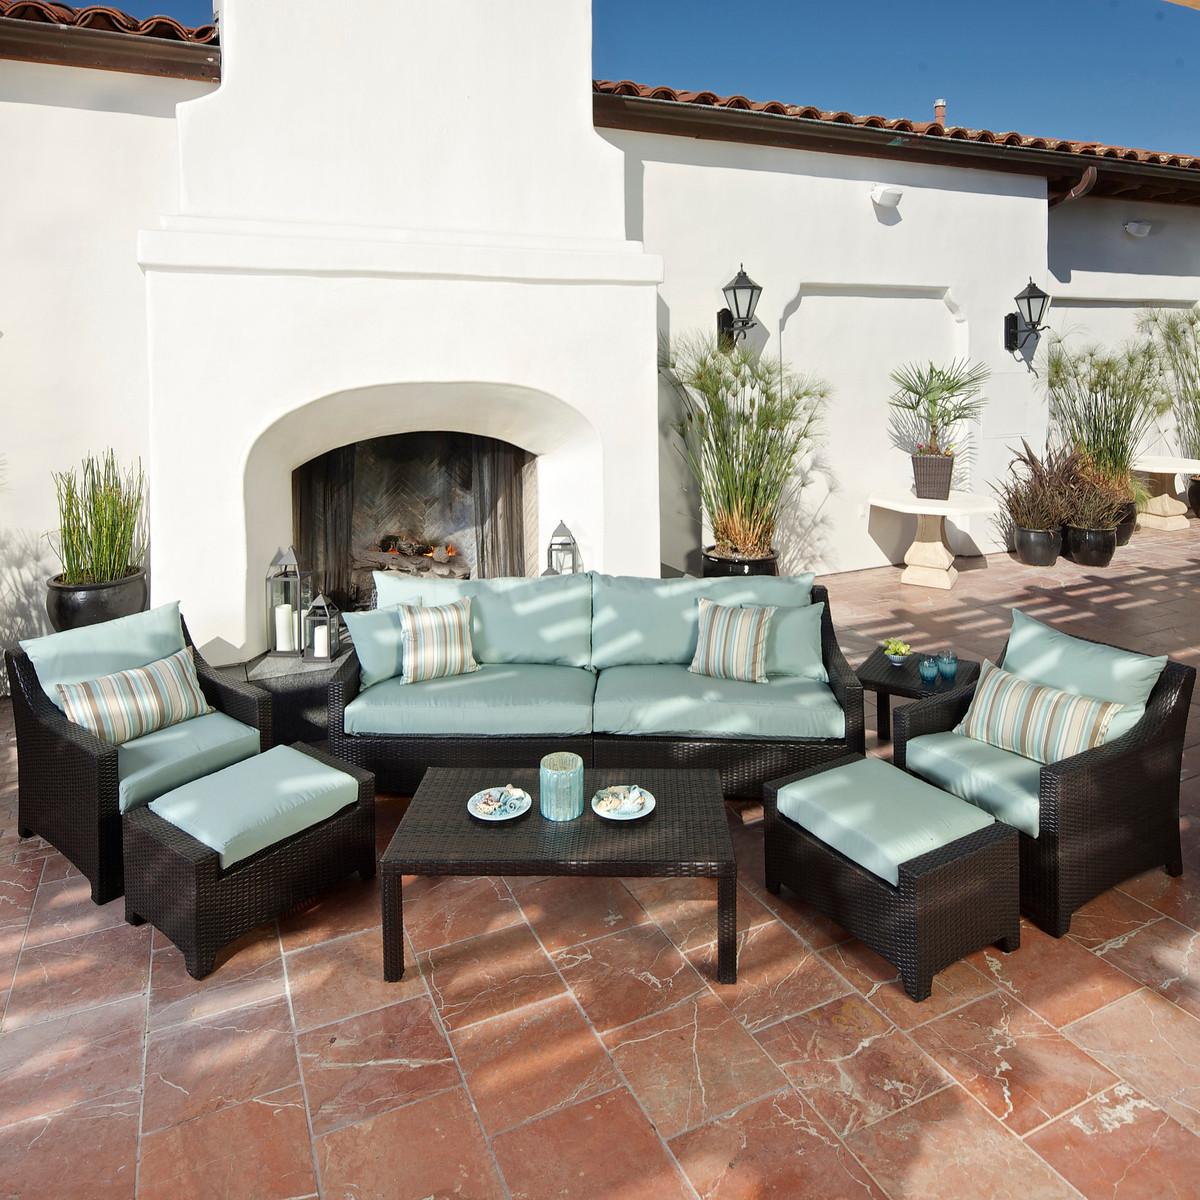 cb2 club sofa ottoman glider cushions rst brands bliss 8 piece chair and ottomans set